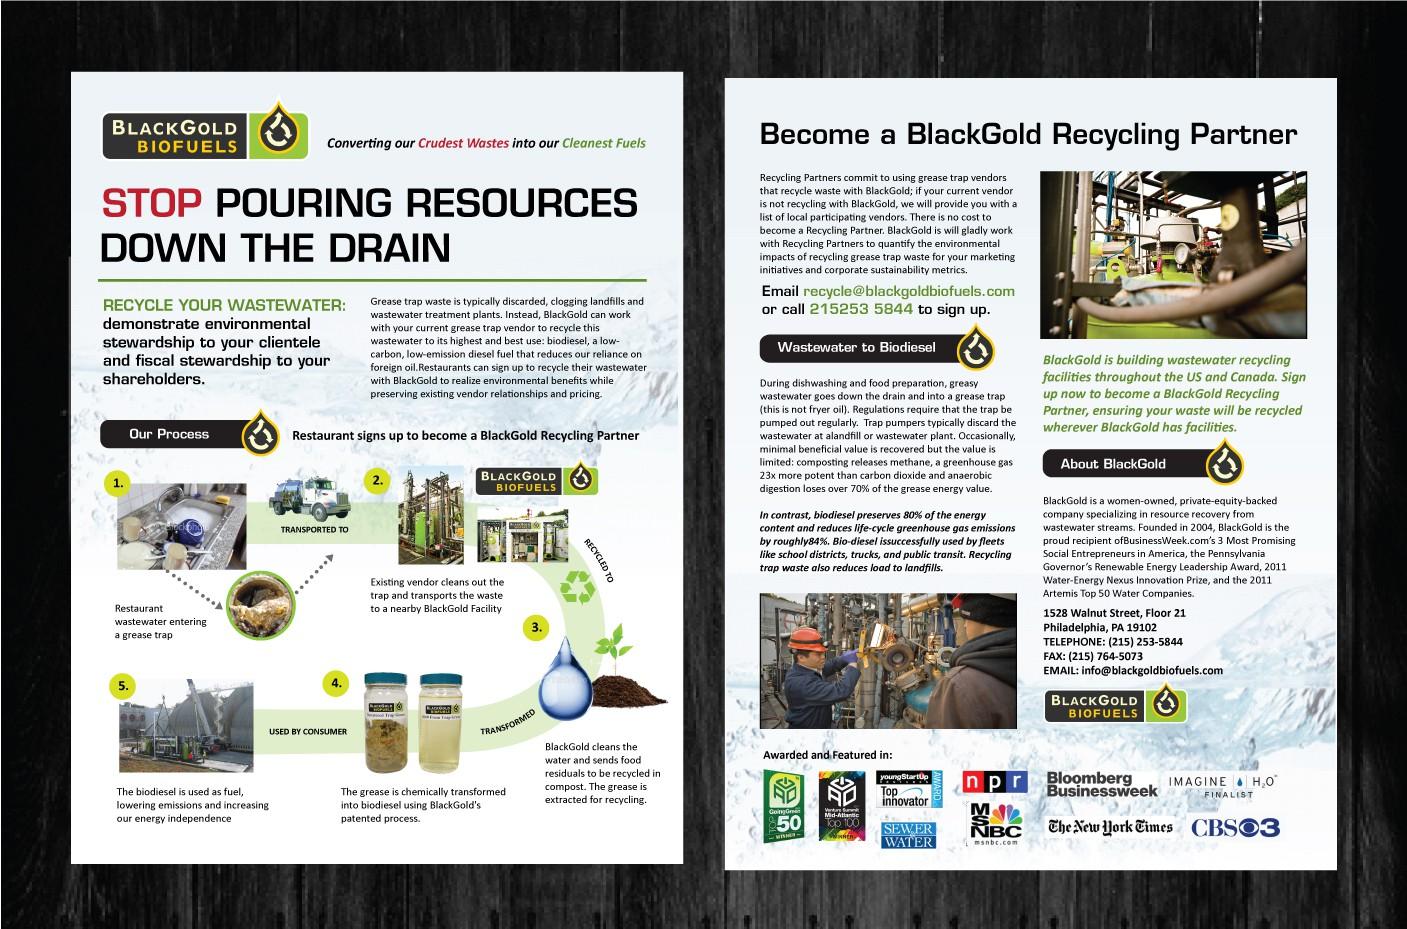 Help BlackGold Biofuels with a handout/brochure!